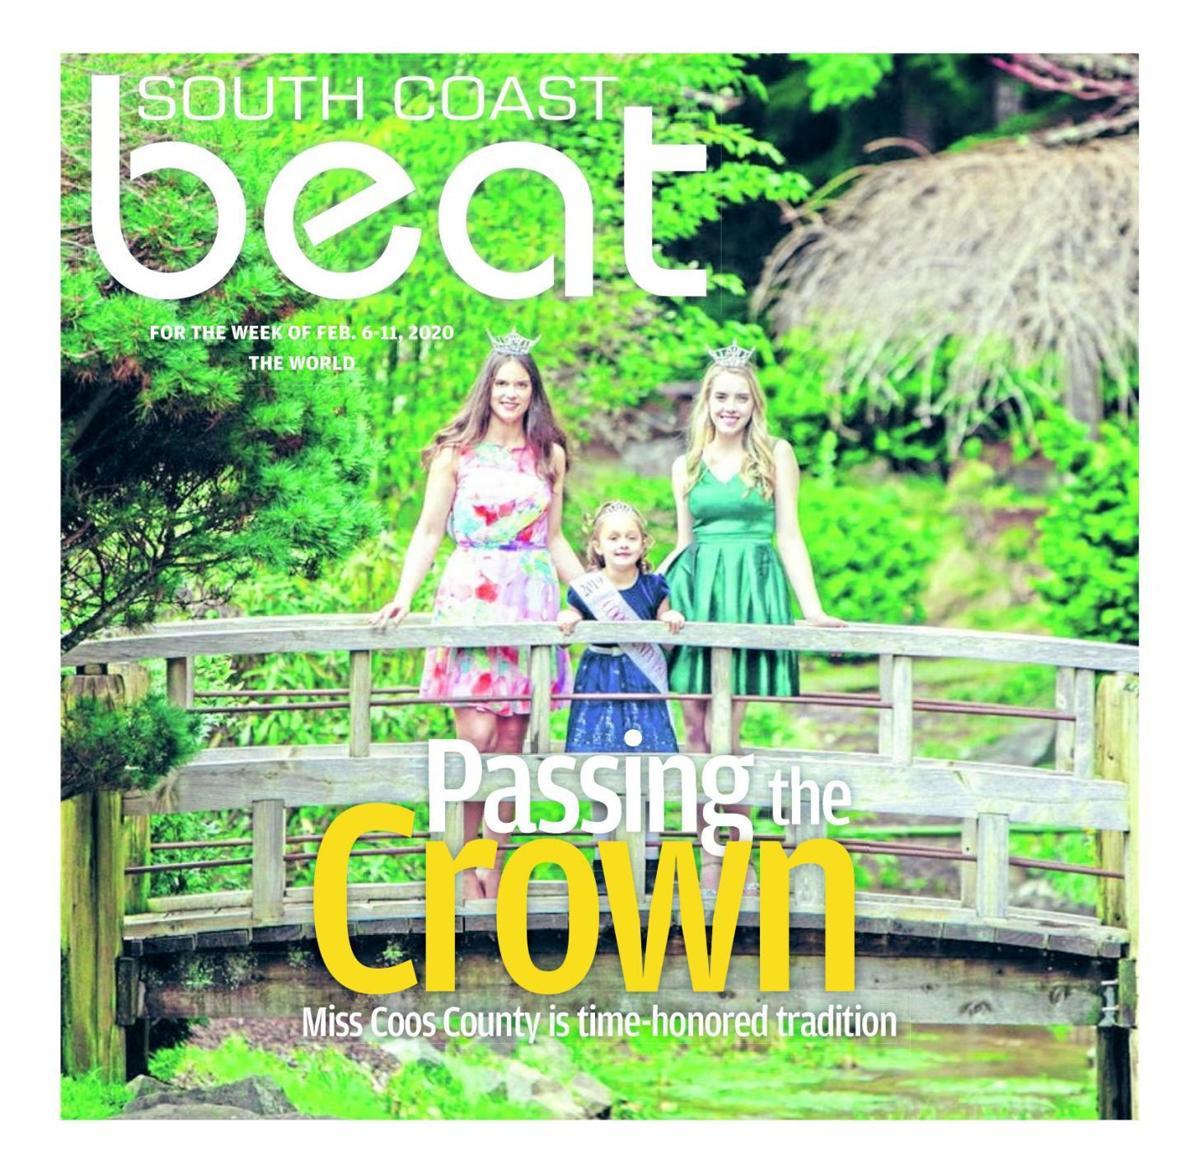 South Coast Beat, Feb. 6, 2020